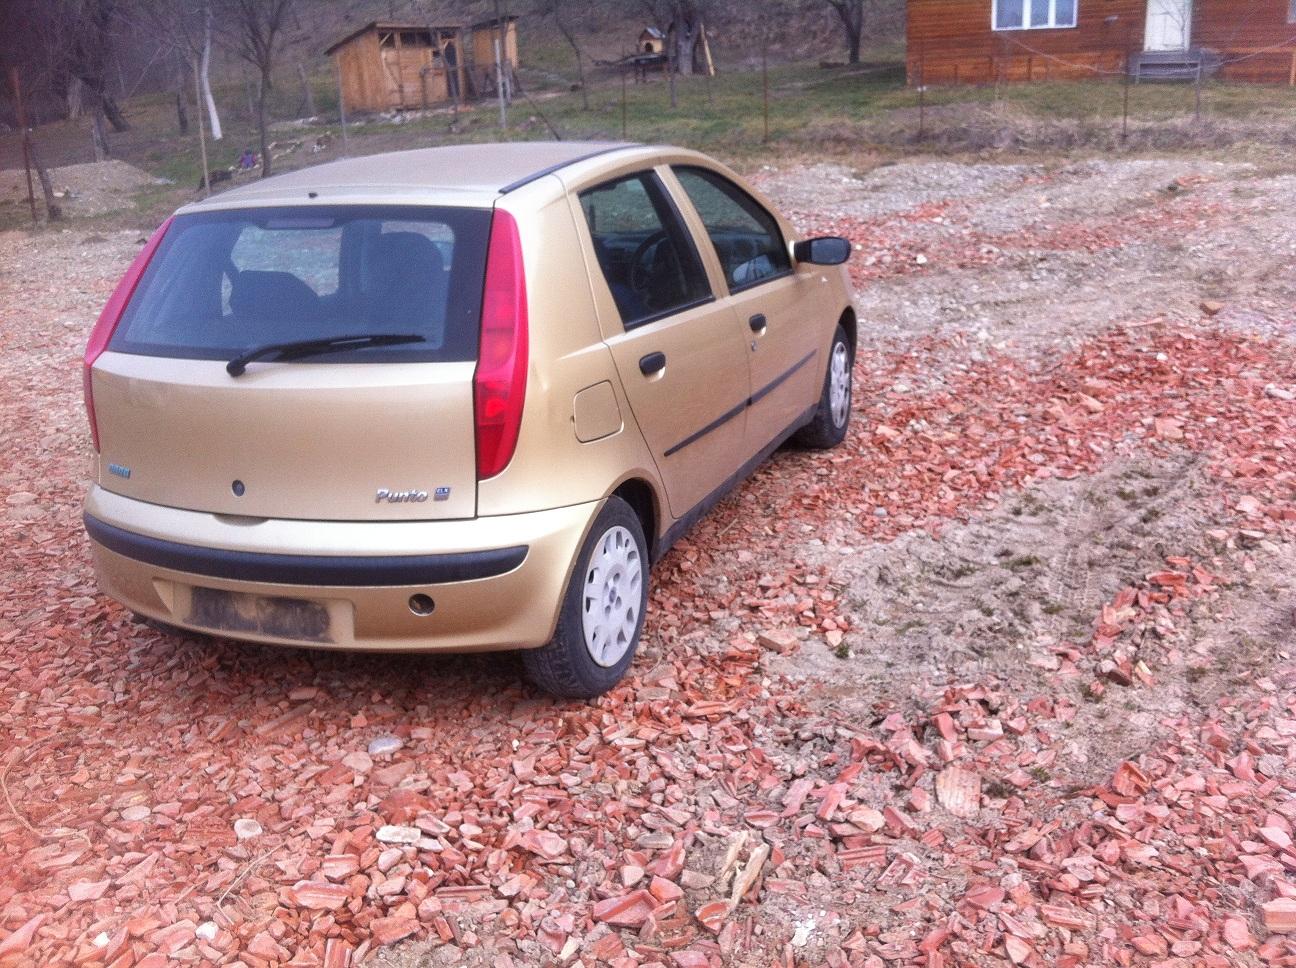 Dezmembrez Fiat Punto 2000 Benzina Hatchback - 29 Mai 2013 - Poza 1